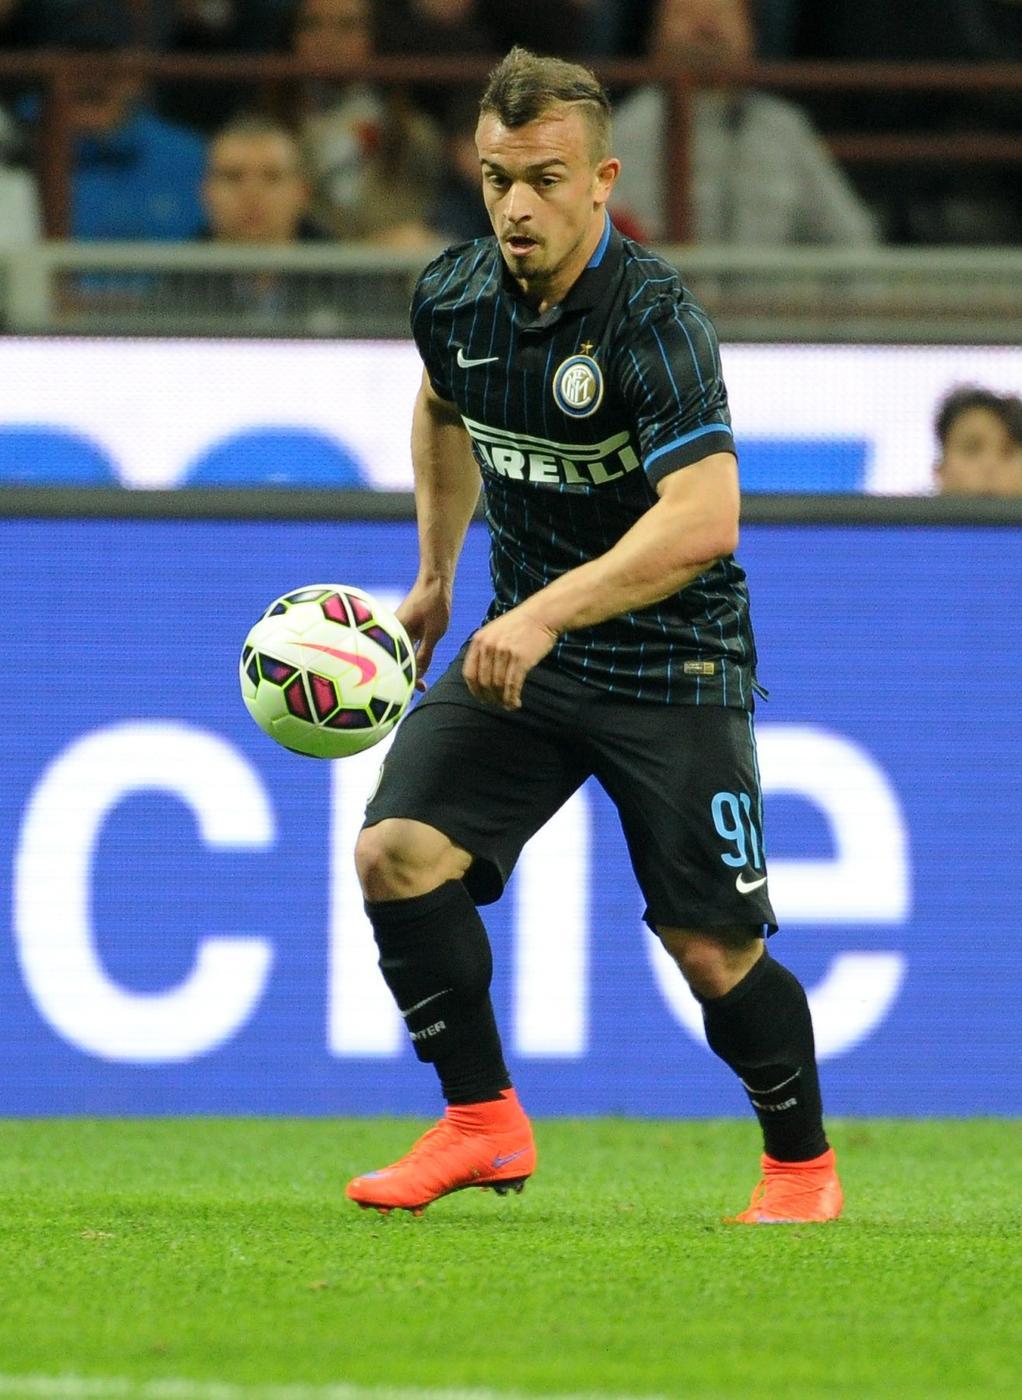 Can Stoke complete the £12million transfer deal for Inter Milan star Xerdan Shaqiri?